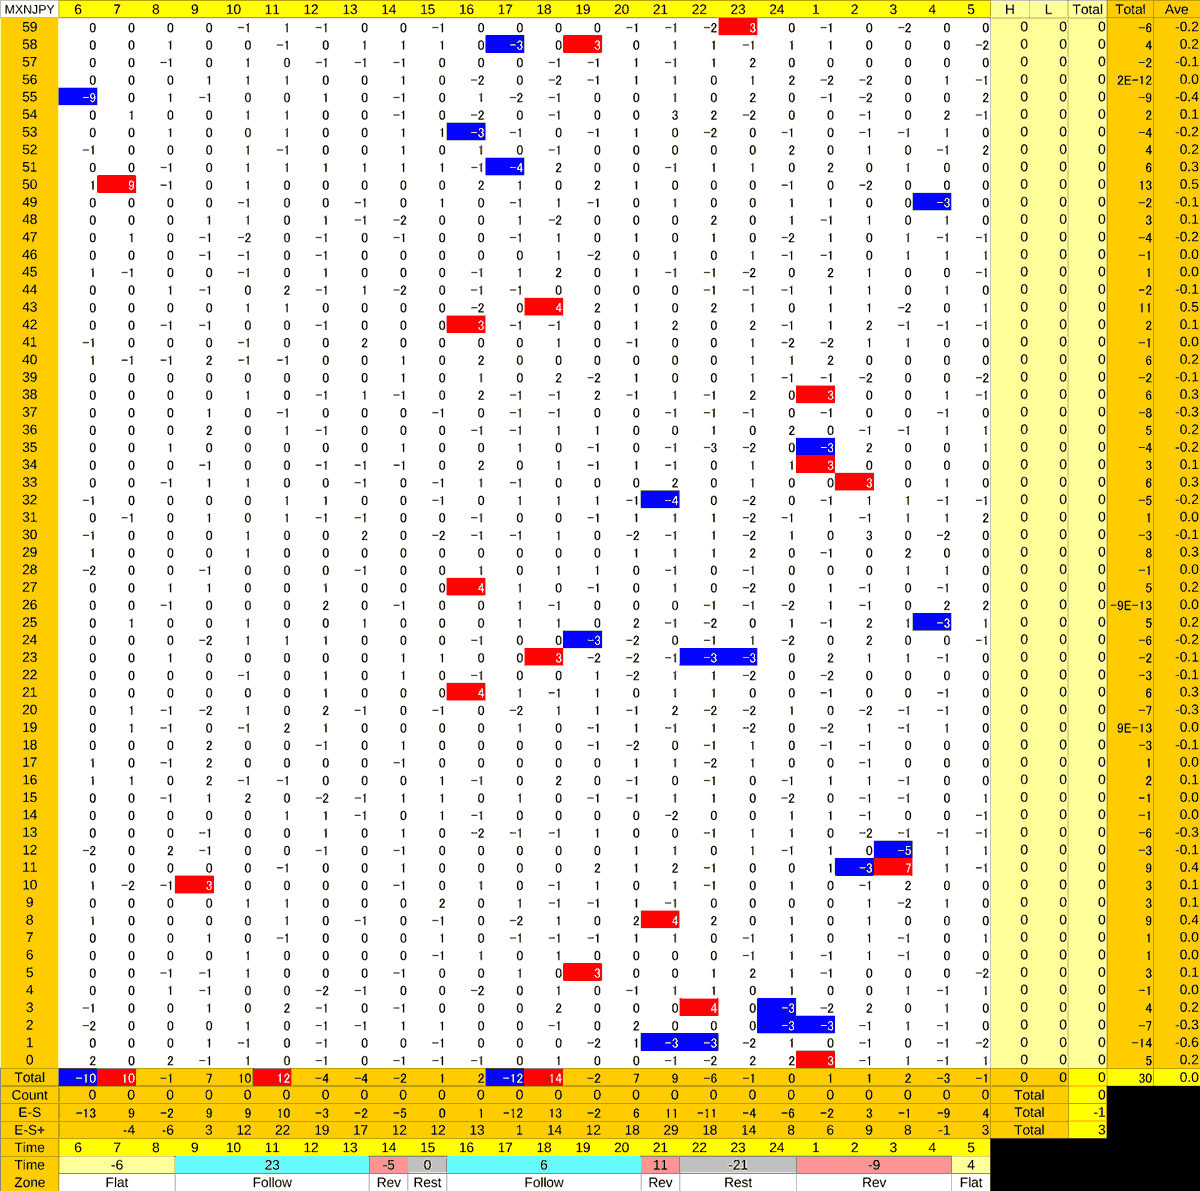 20210119_HS(3)MXNJPY